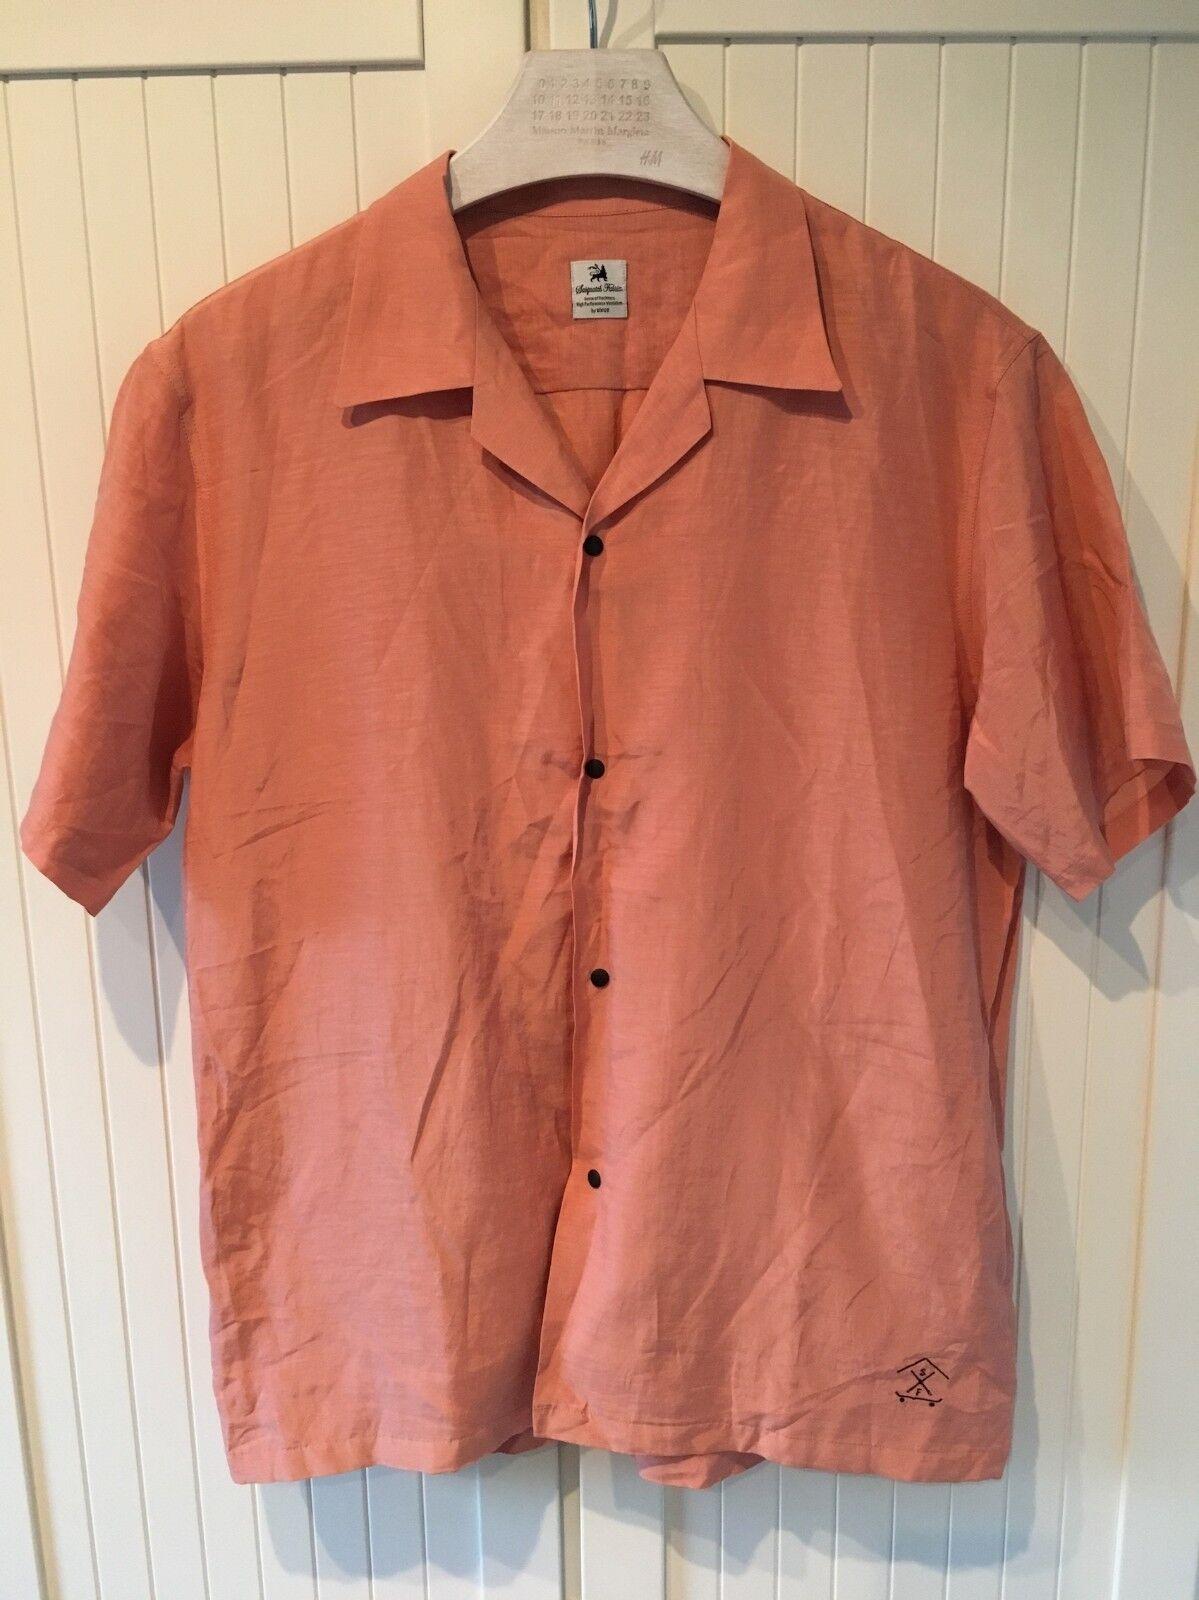 Sasquatchfabrix Men's Camp-collar Voile Shirt in Salmon Hue, XL